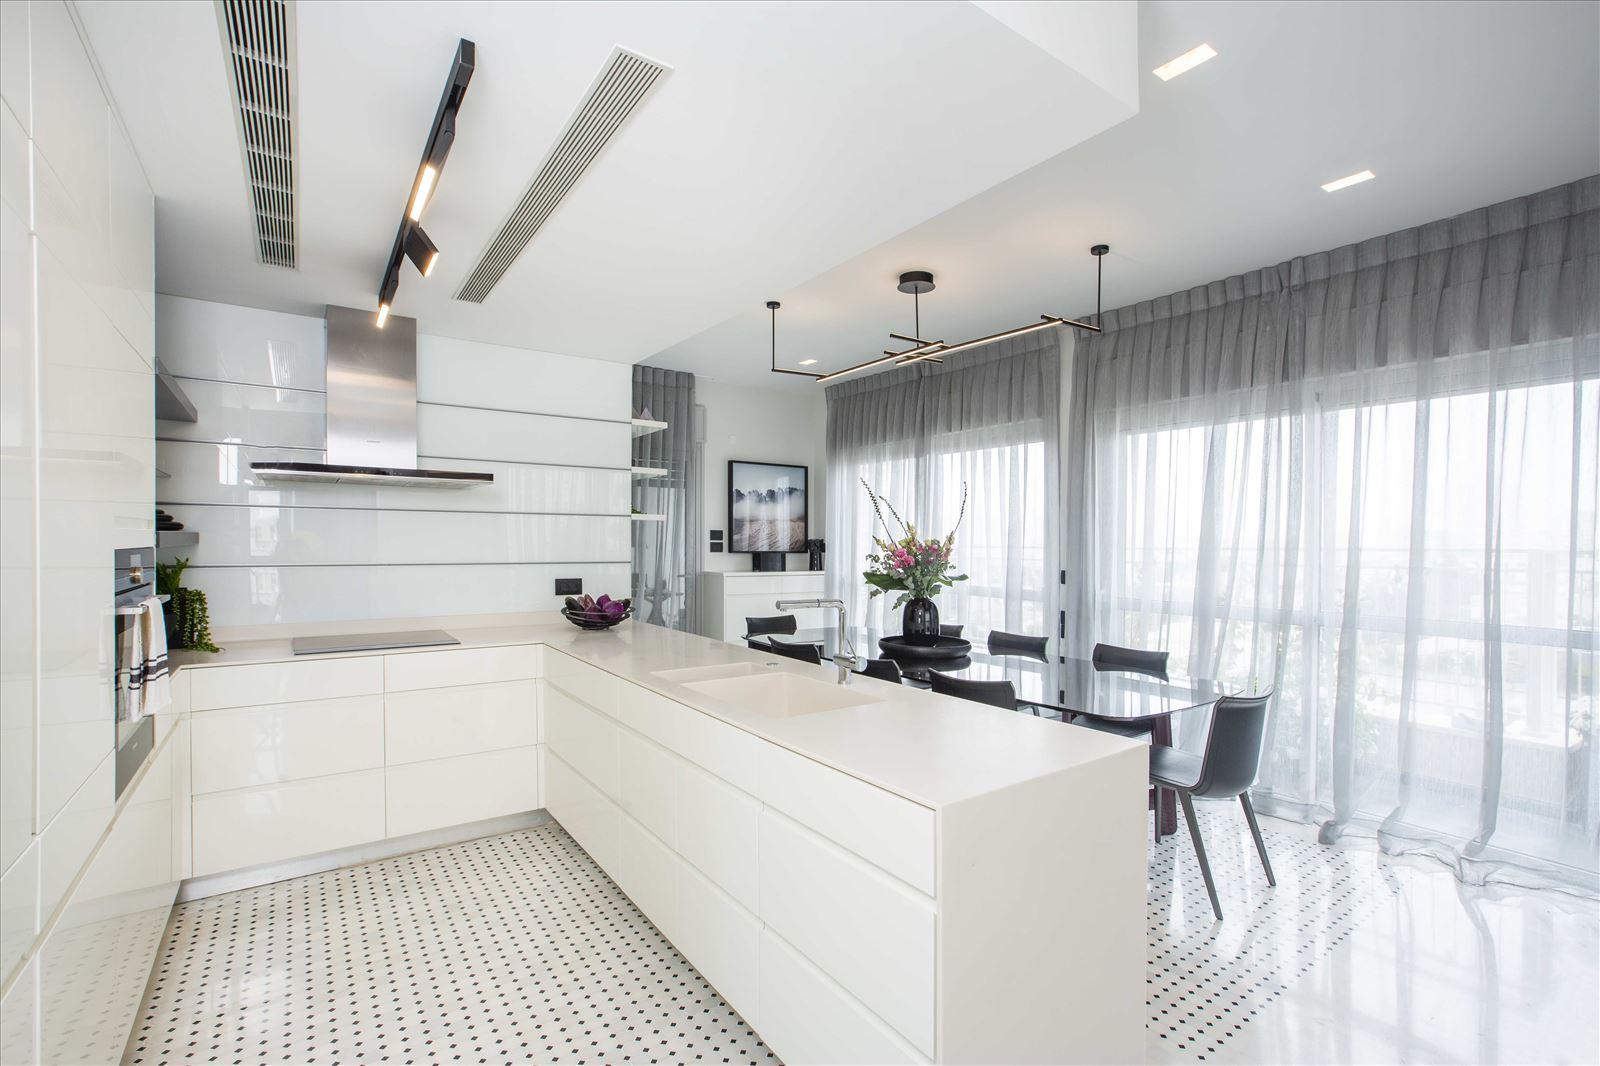 Tel Aviv apartment in Parisian aroma כל התאורה במטבח נעשתה על ידי דורי קמחי